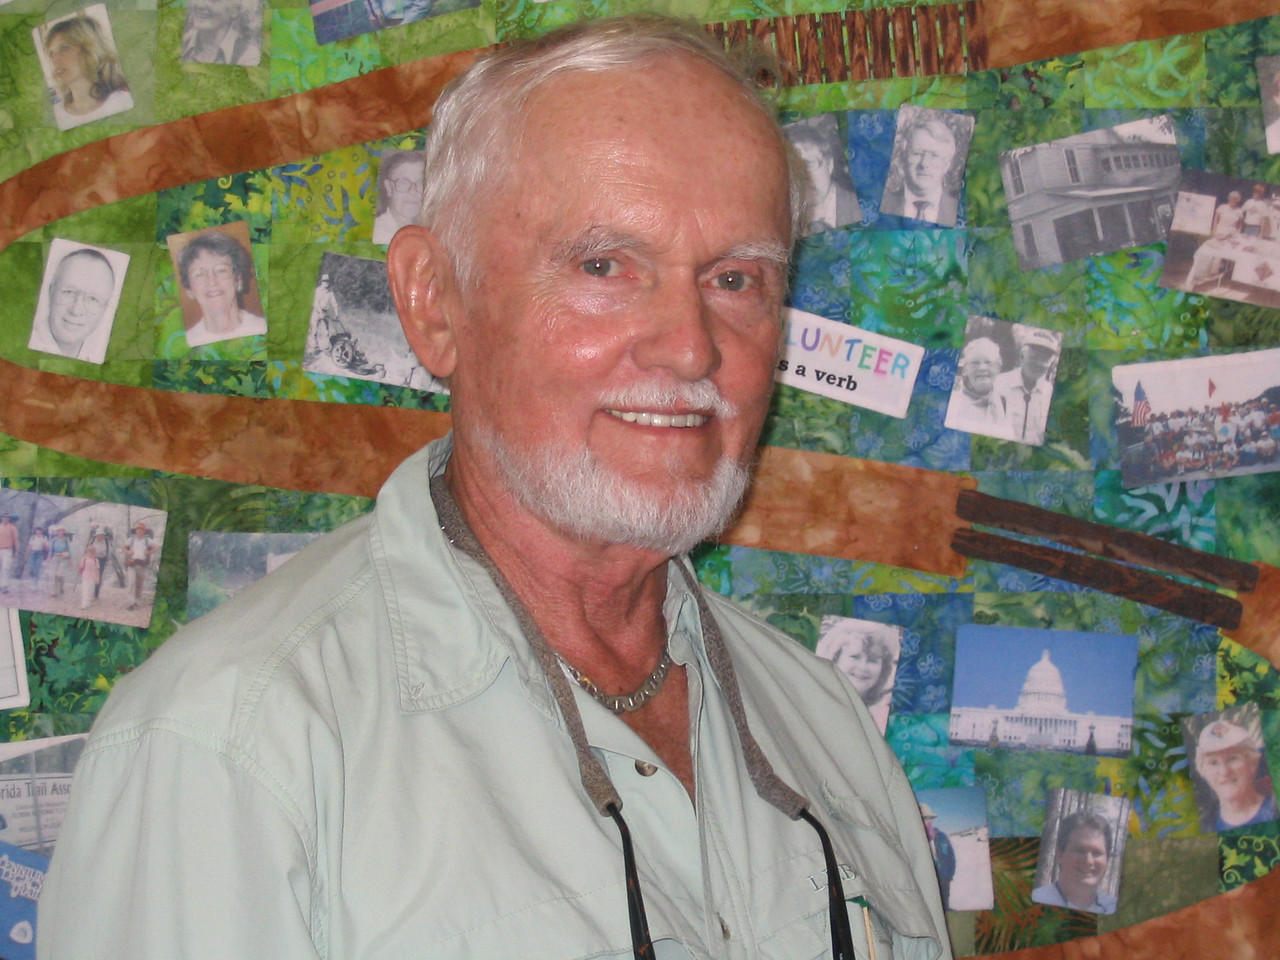 Big O Hike founder Gordon Johnson<br /> PHOTO CREDIT: Diane Wilkins / Florida Trail Association